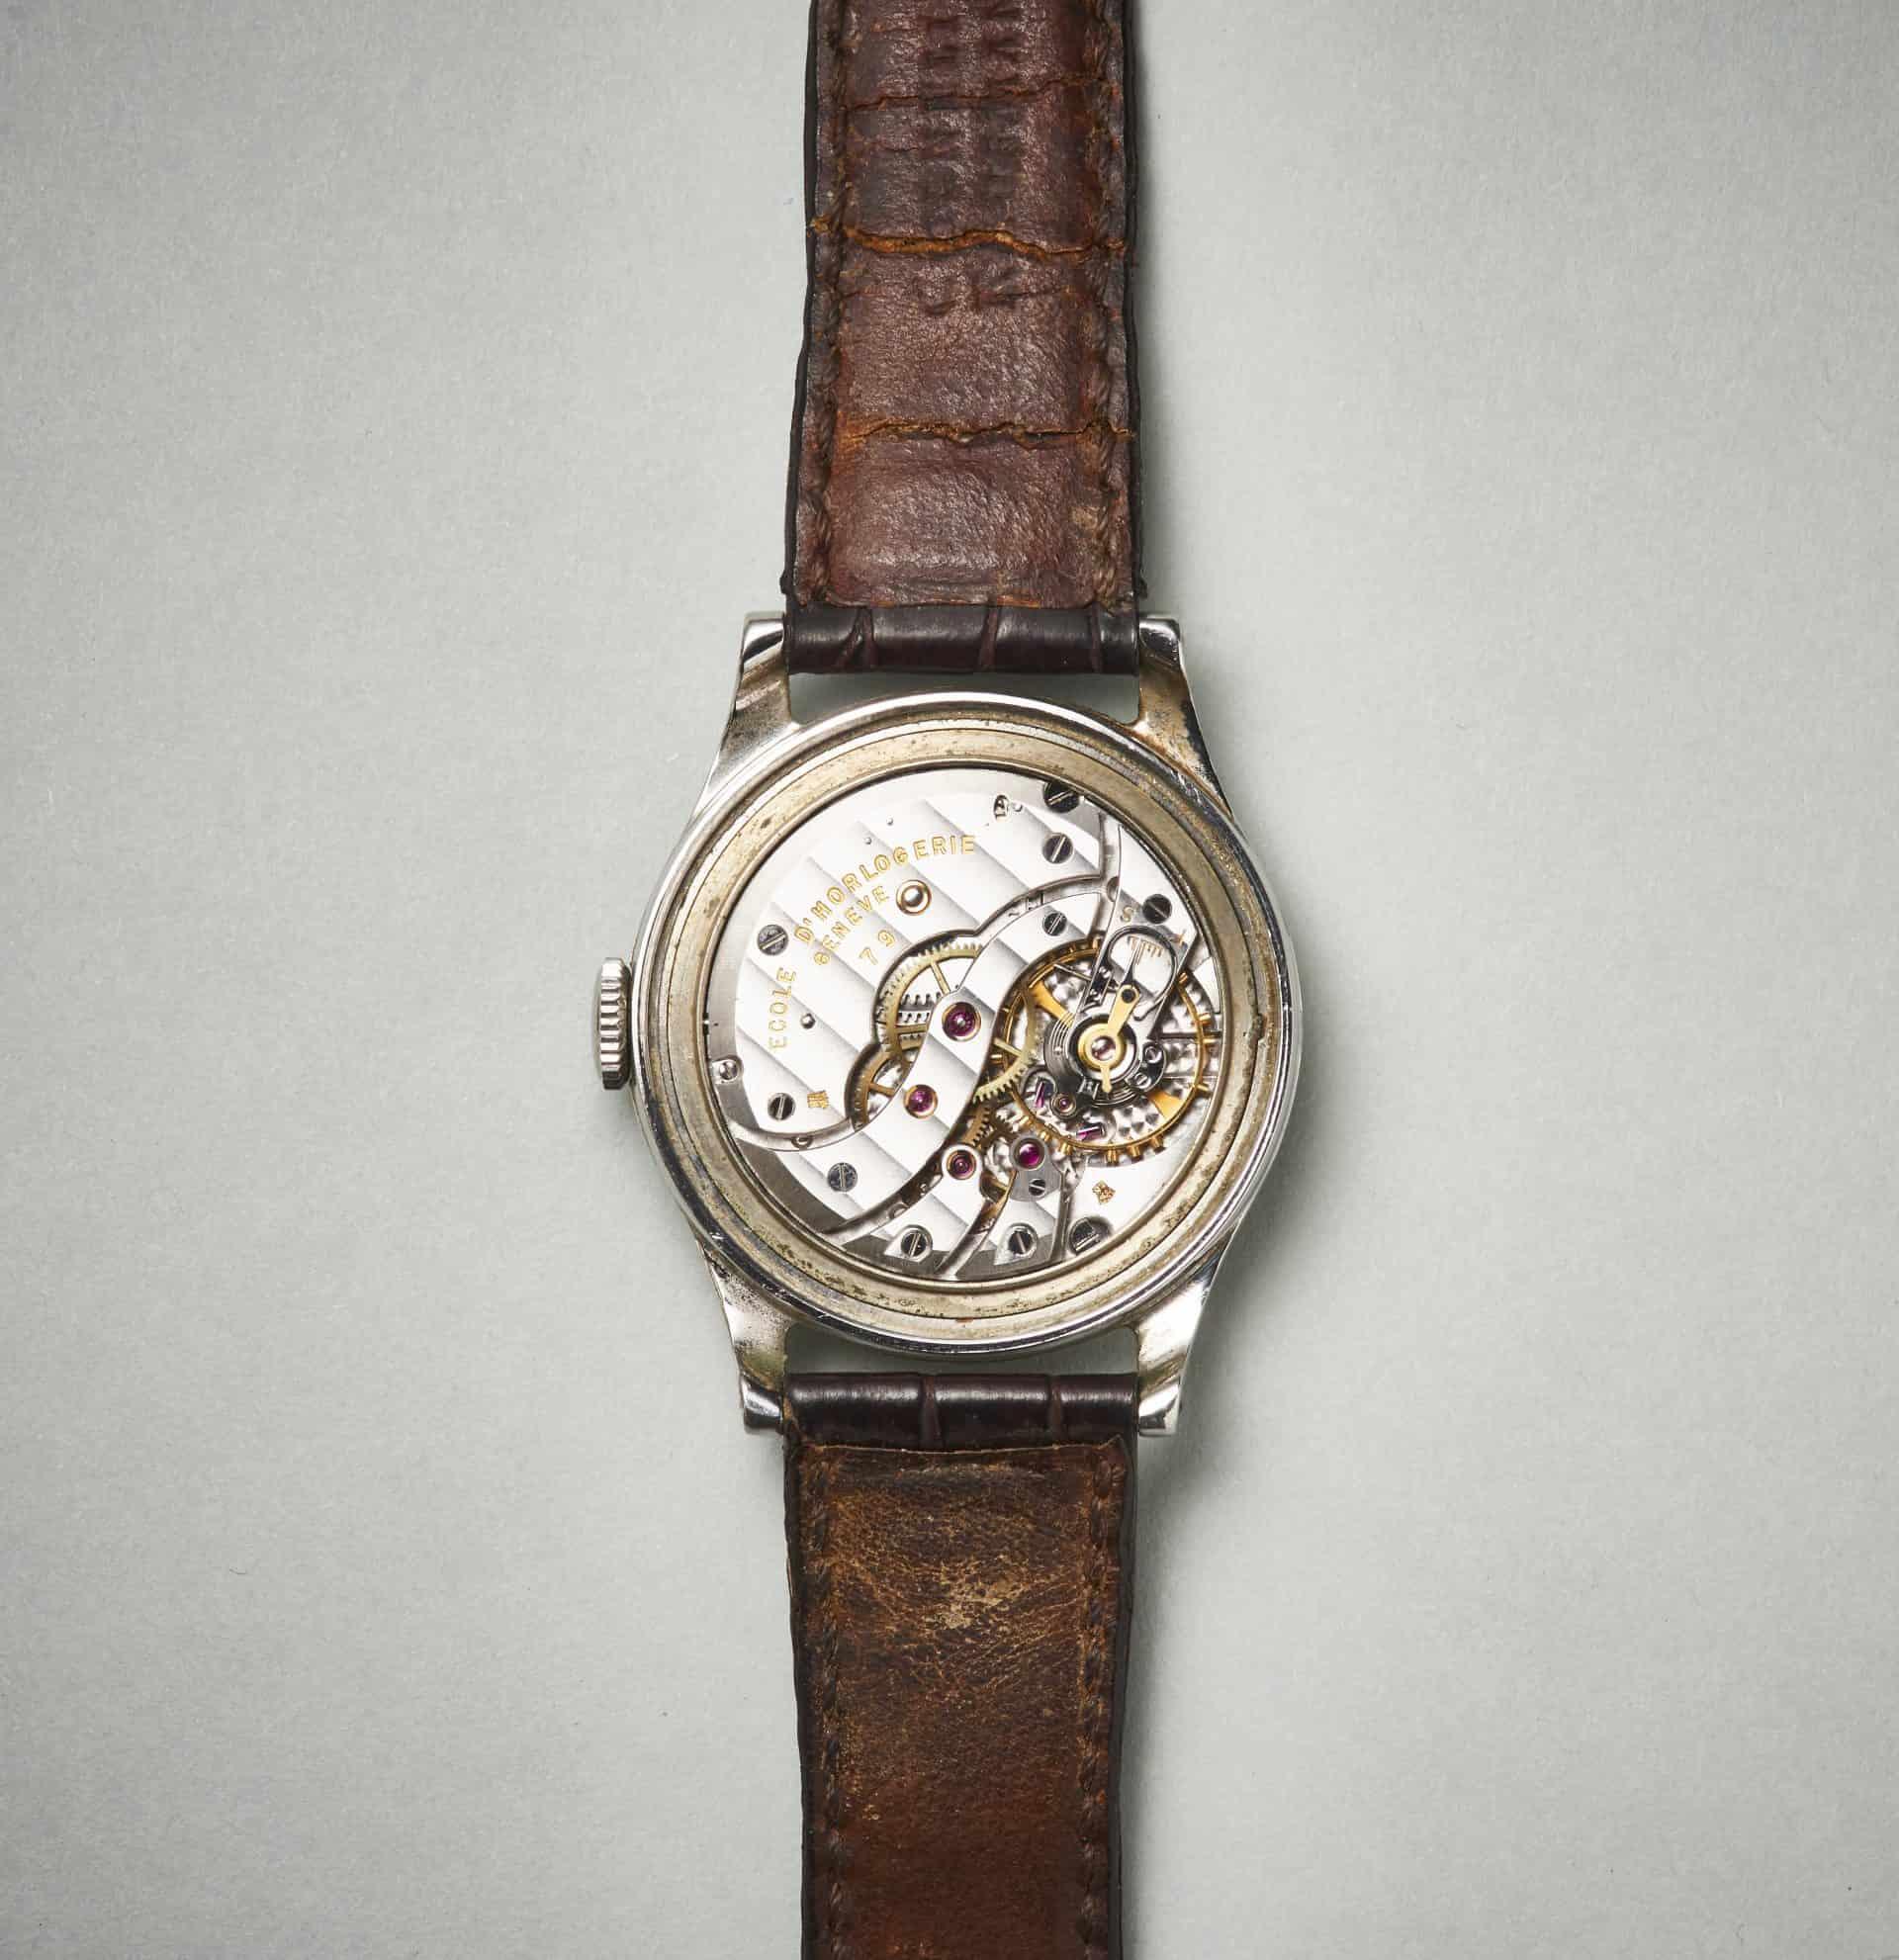 Ecole dHorlogerie Geneve Patek Philippe Ref 2509 Werk Uhrenkosmos